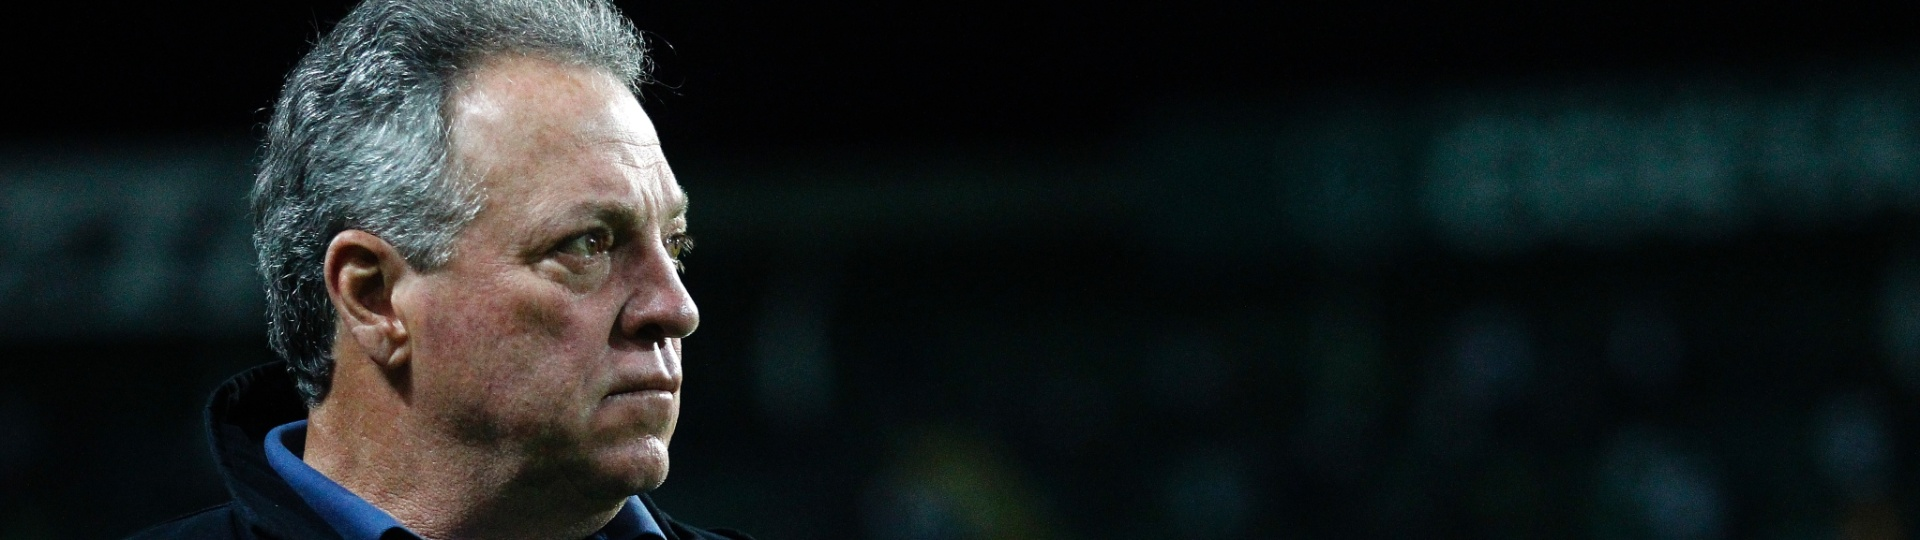 Abel Braga, técnico do Fluminense, em partida contra o Coritba pelo Campeonato Brasileiro 2017